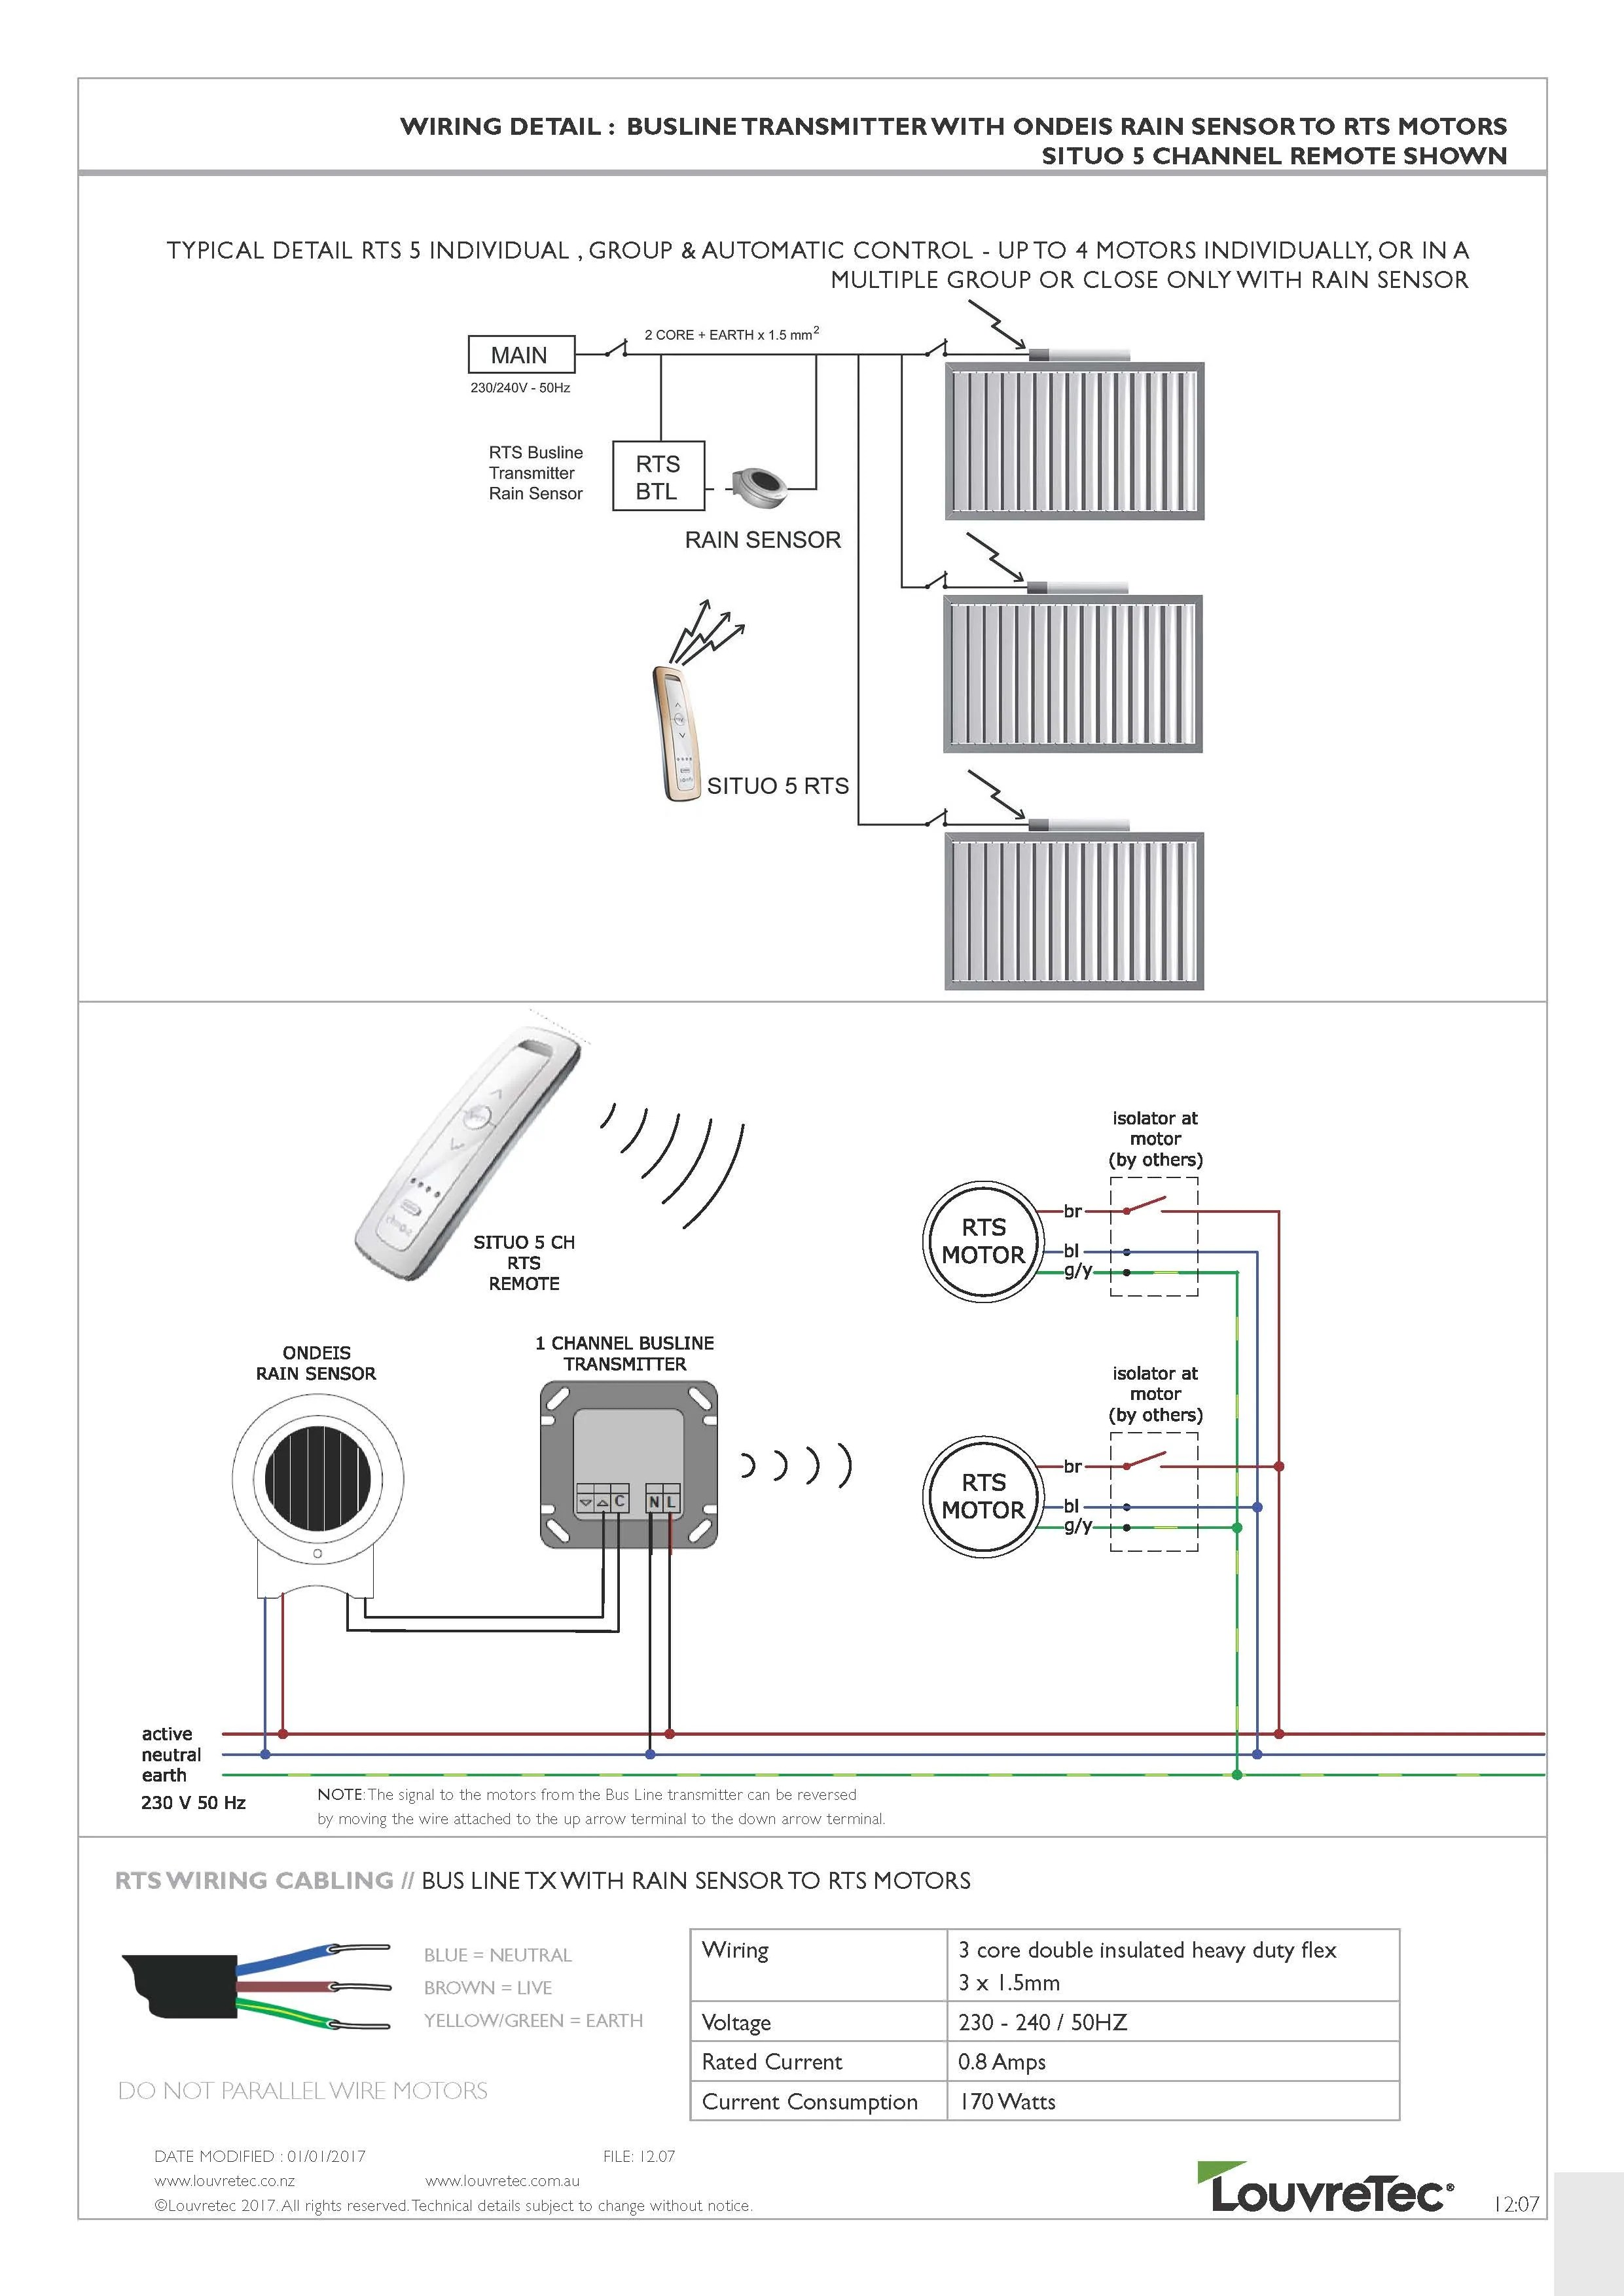 medium resolution of group automatic control w rain sensor 12 07